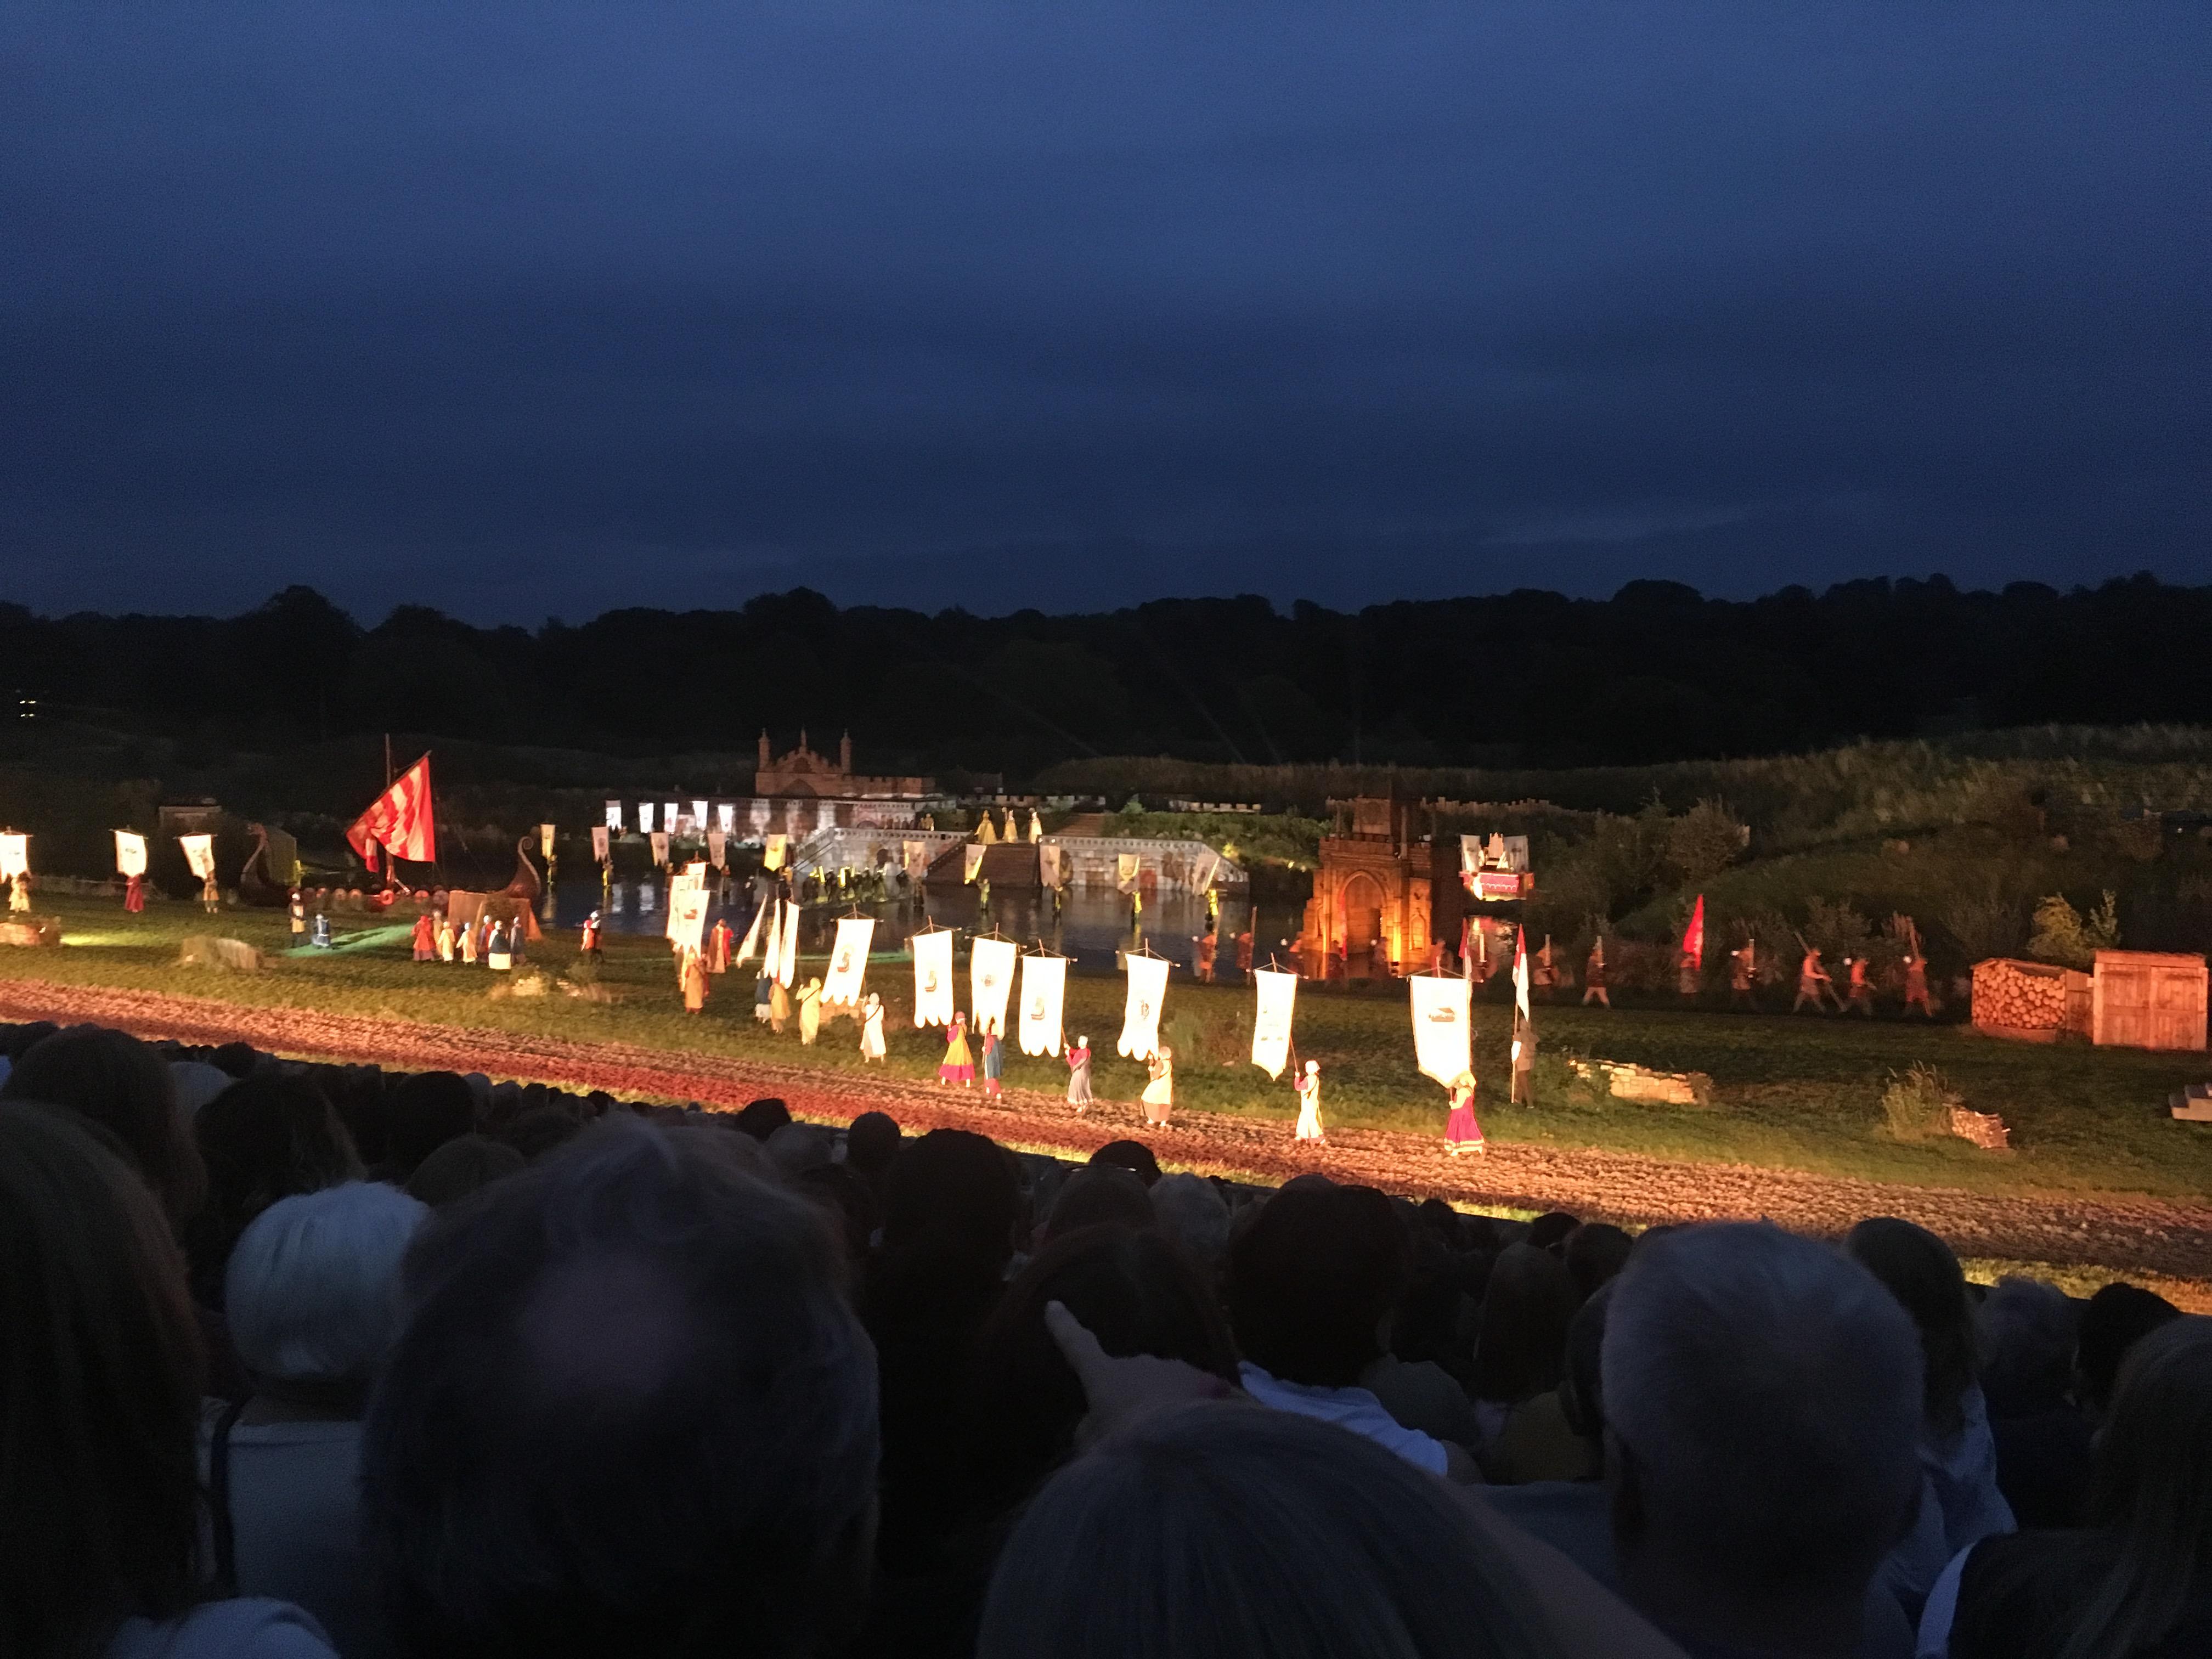 A Ceremony Scene from Kynren